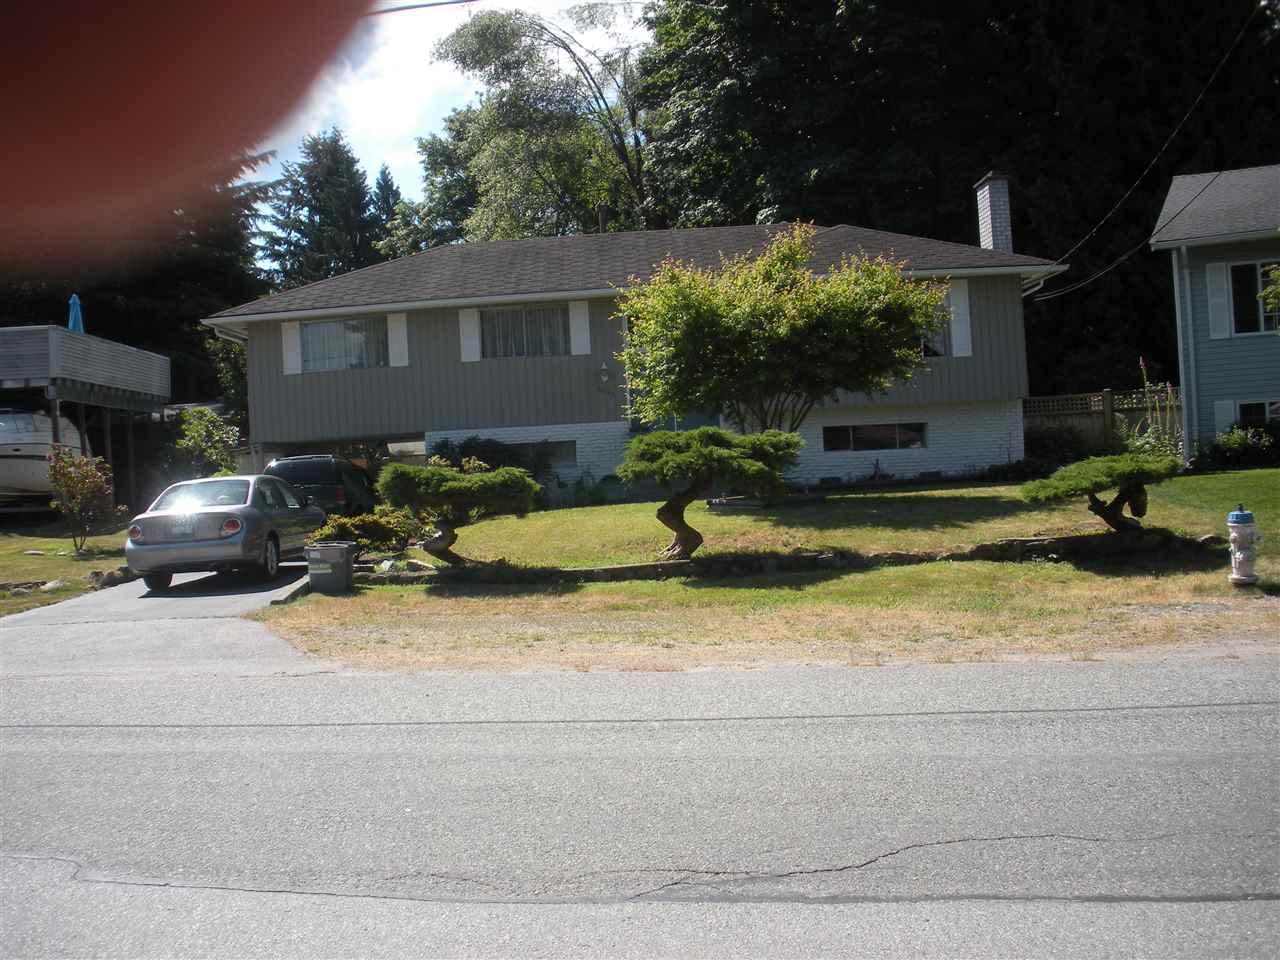 Detached at 11240 KENDALE WAY, N. Delta, British Columbia. Image 1